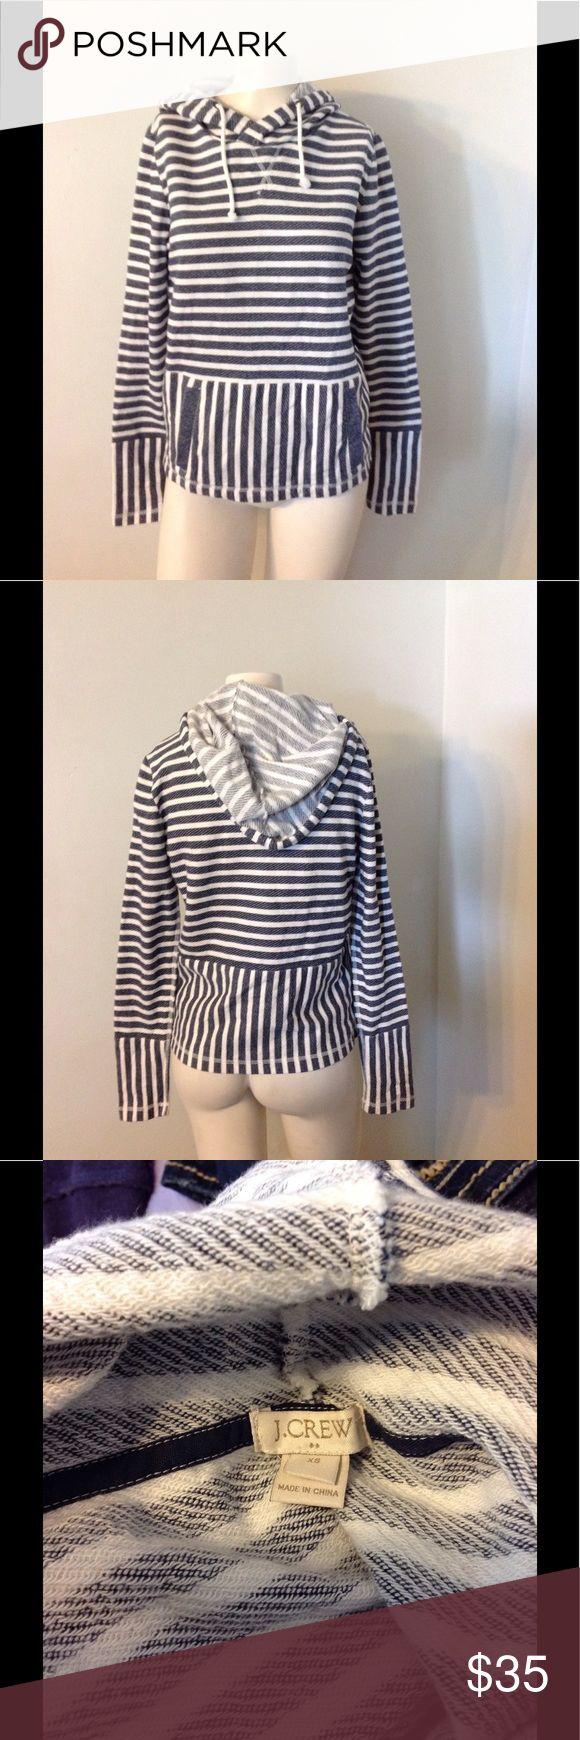 J. Crew Striped Nautical Hoodie XS Very nice J. Crew striped hoodie. Made of 100% cotton in size XS. From Sp 16. Great condition J. Crew Tops Sweatshirts & Hoodies